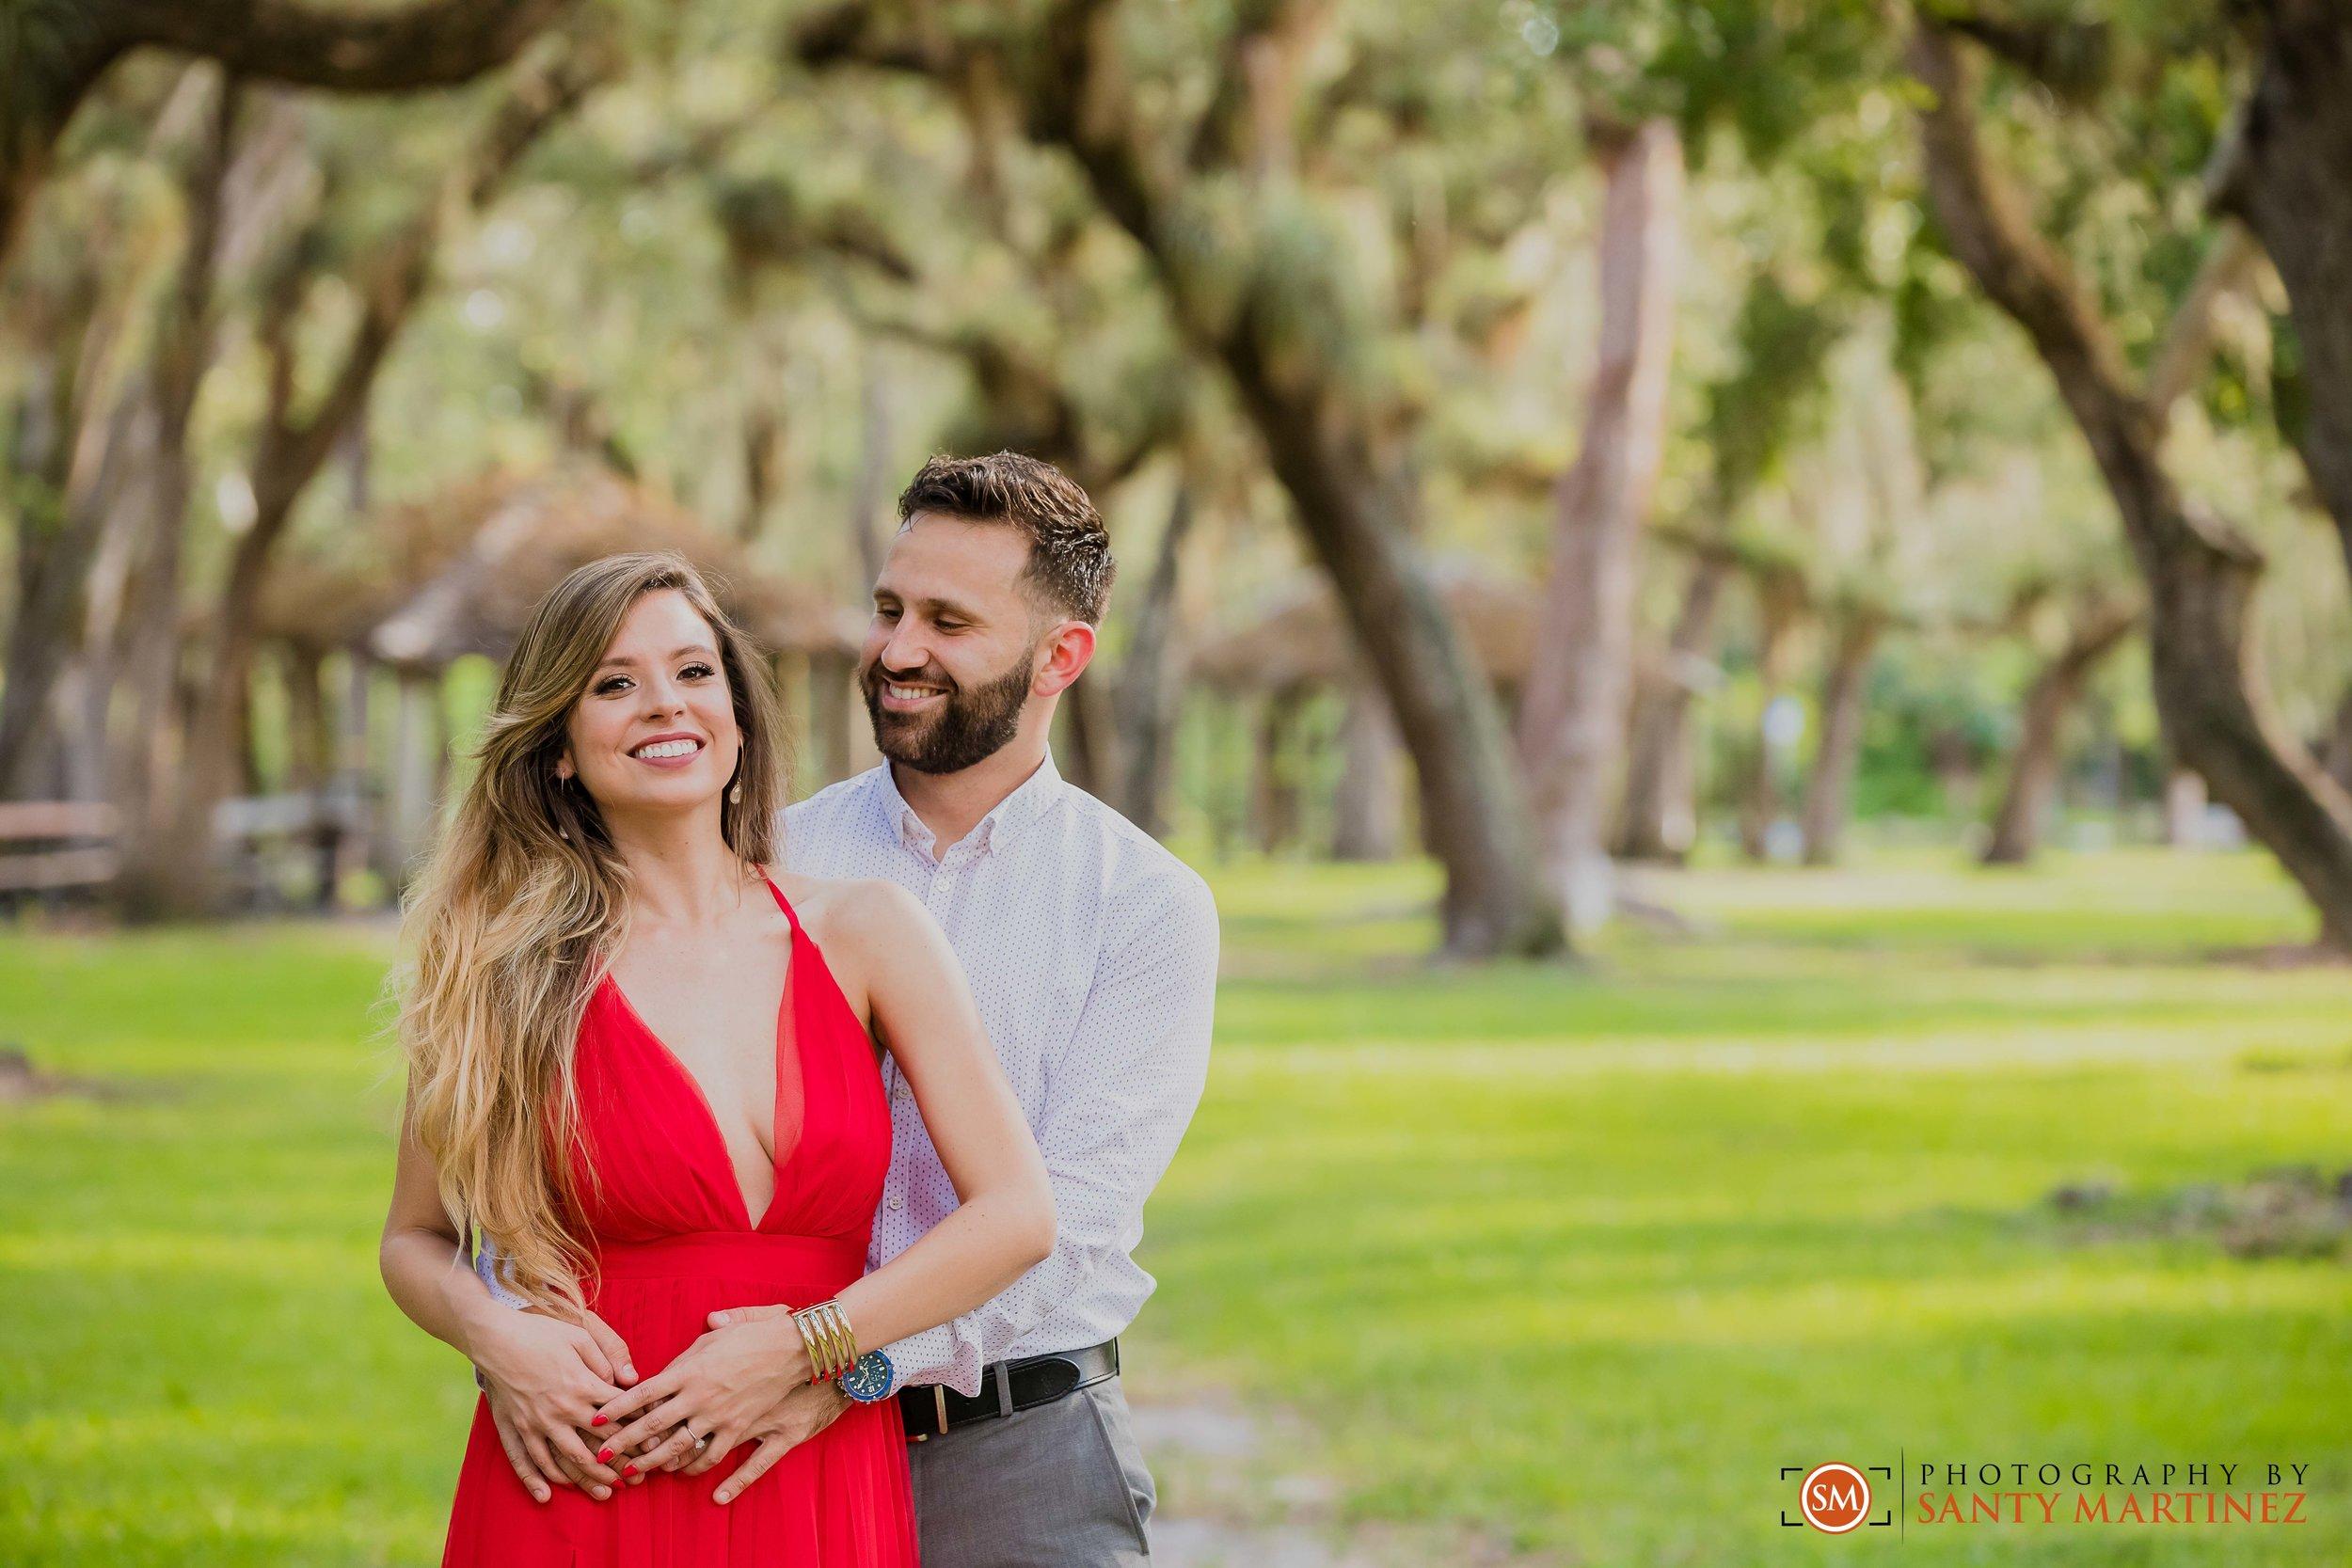 Engagement Session - Matheson Hammock Park - Santy Martinez Wedding Photographer-2.jpg